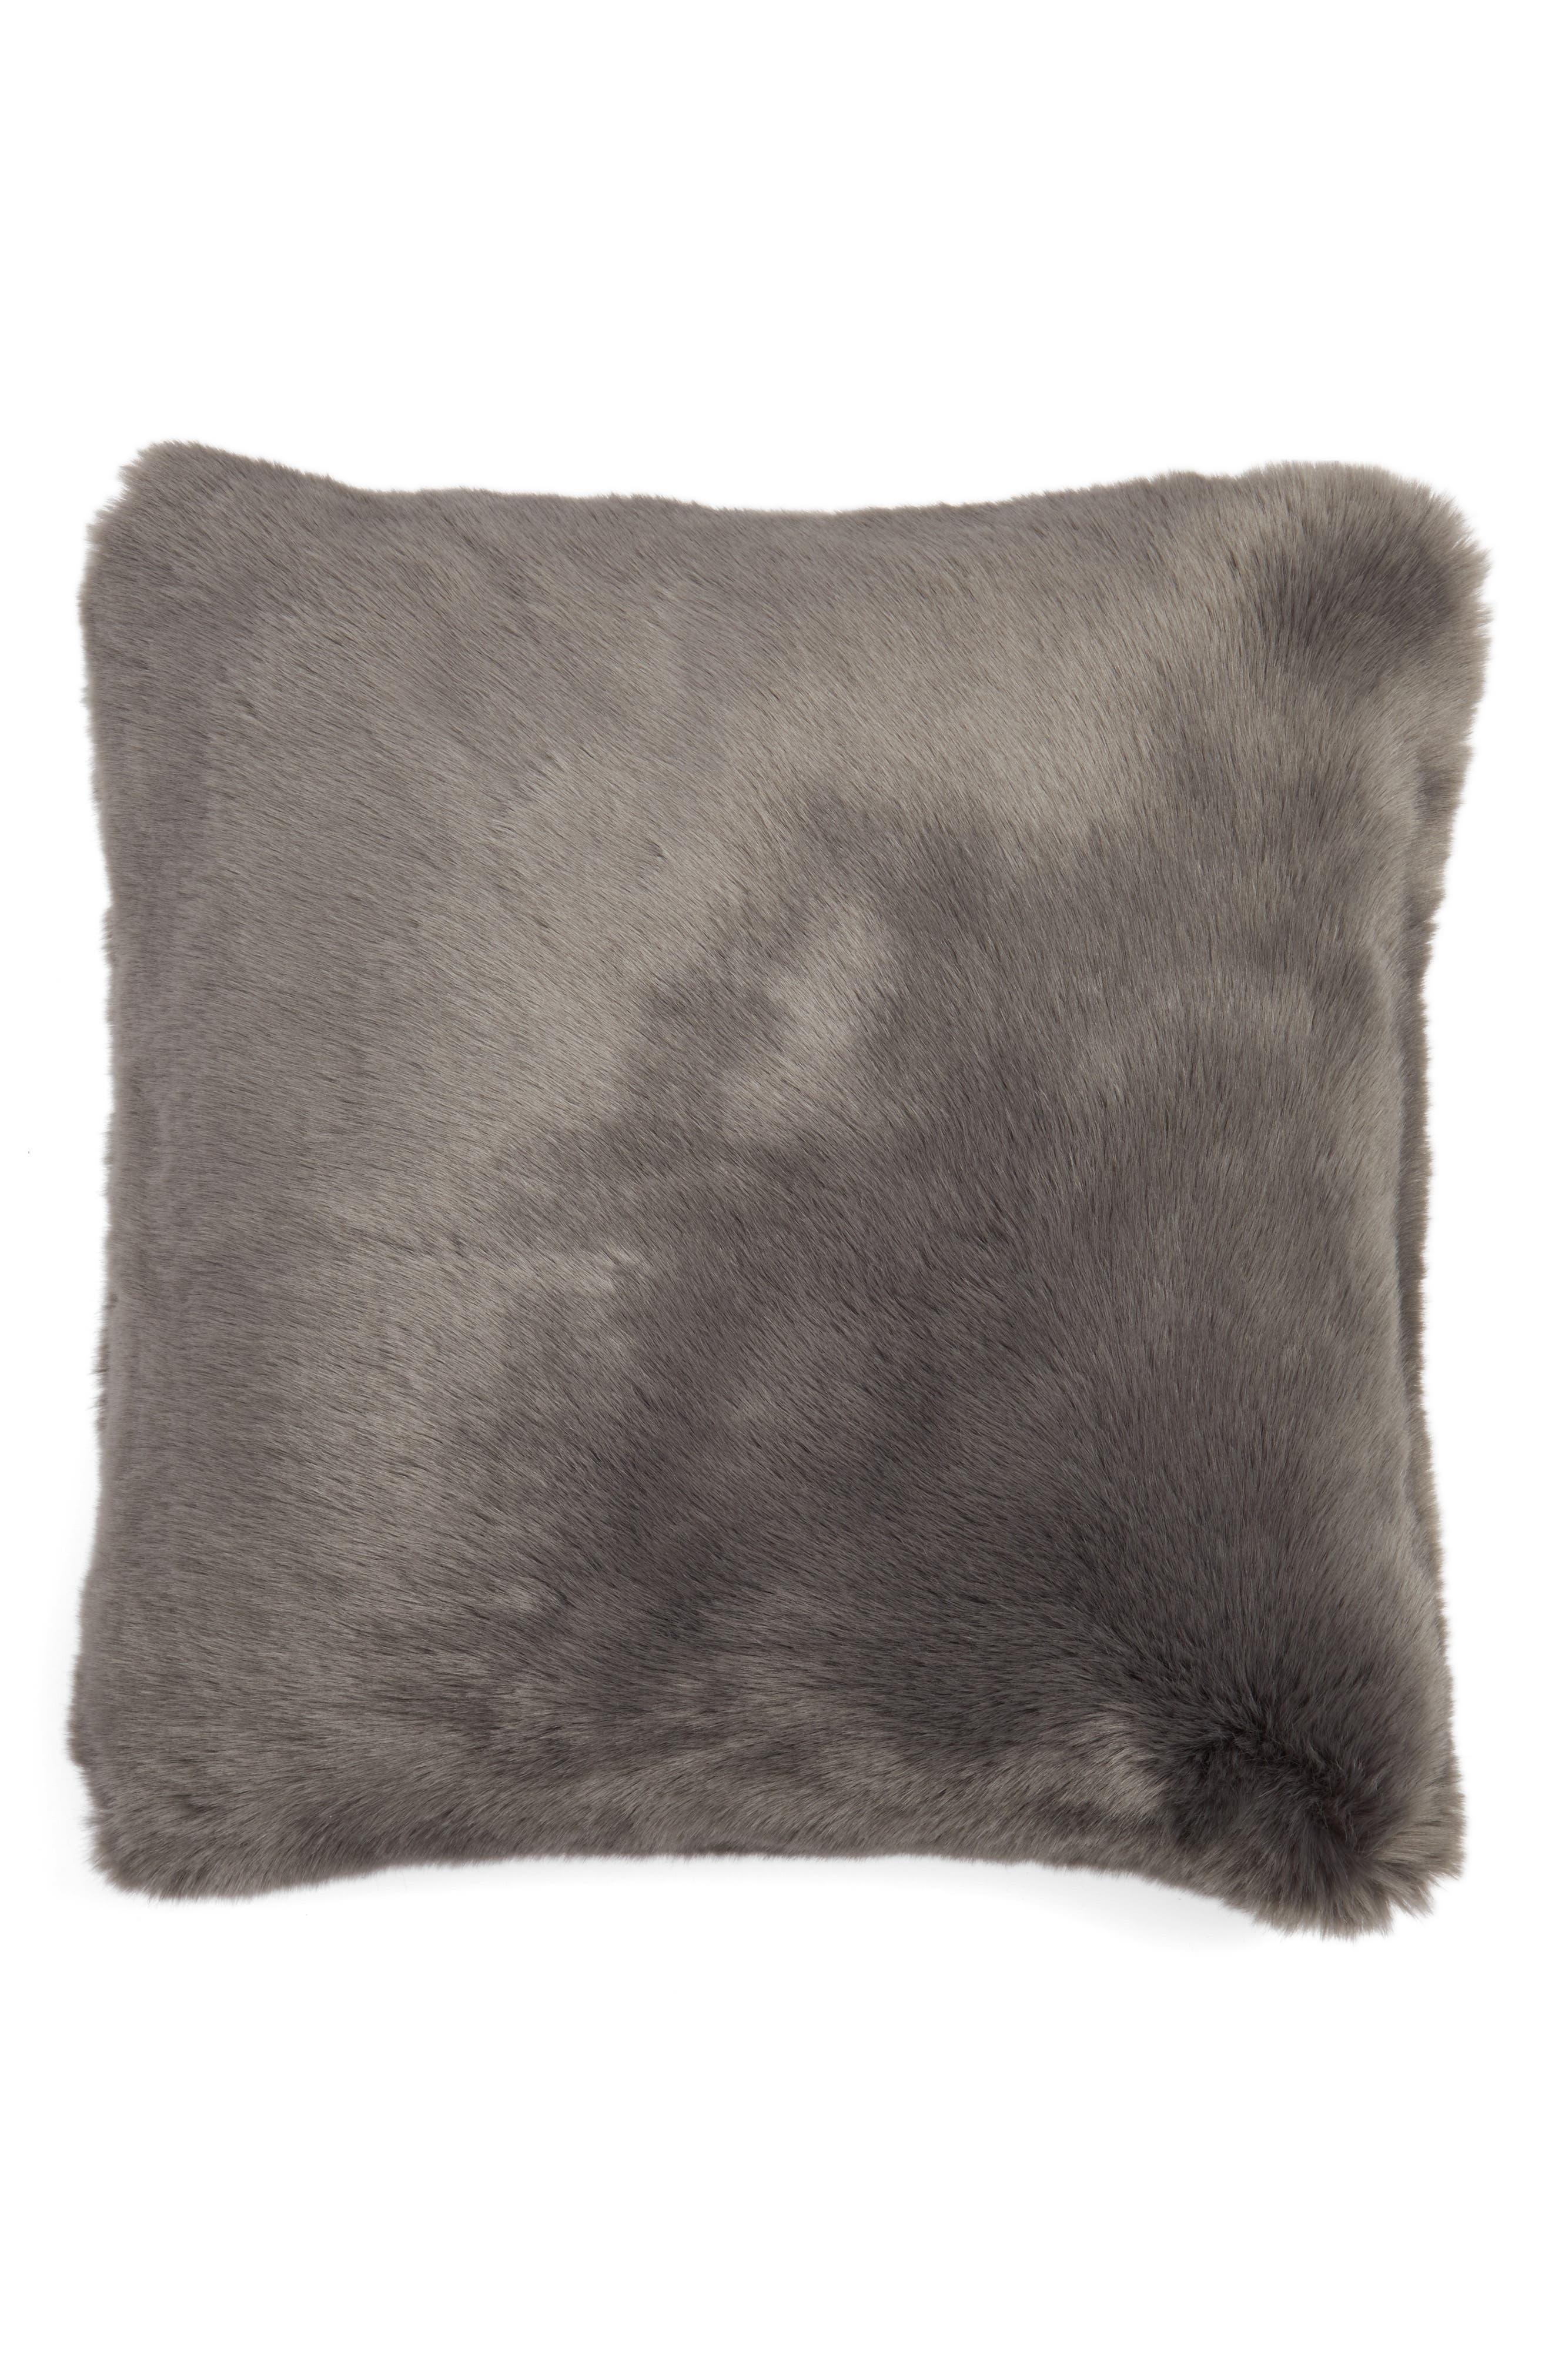 Decorative   Throw Pillows  cb000cef7f